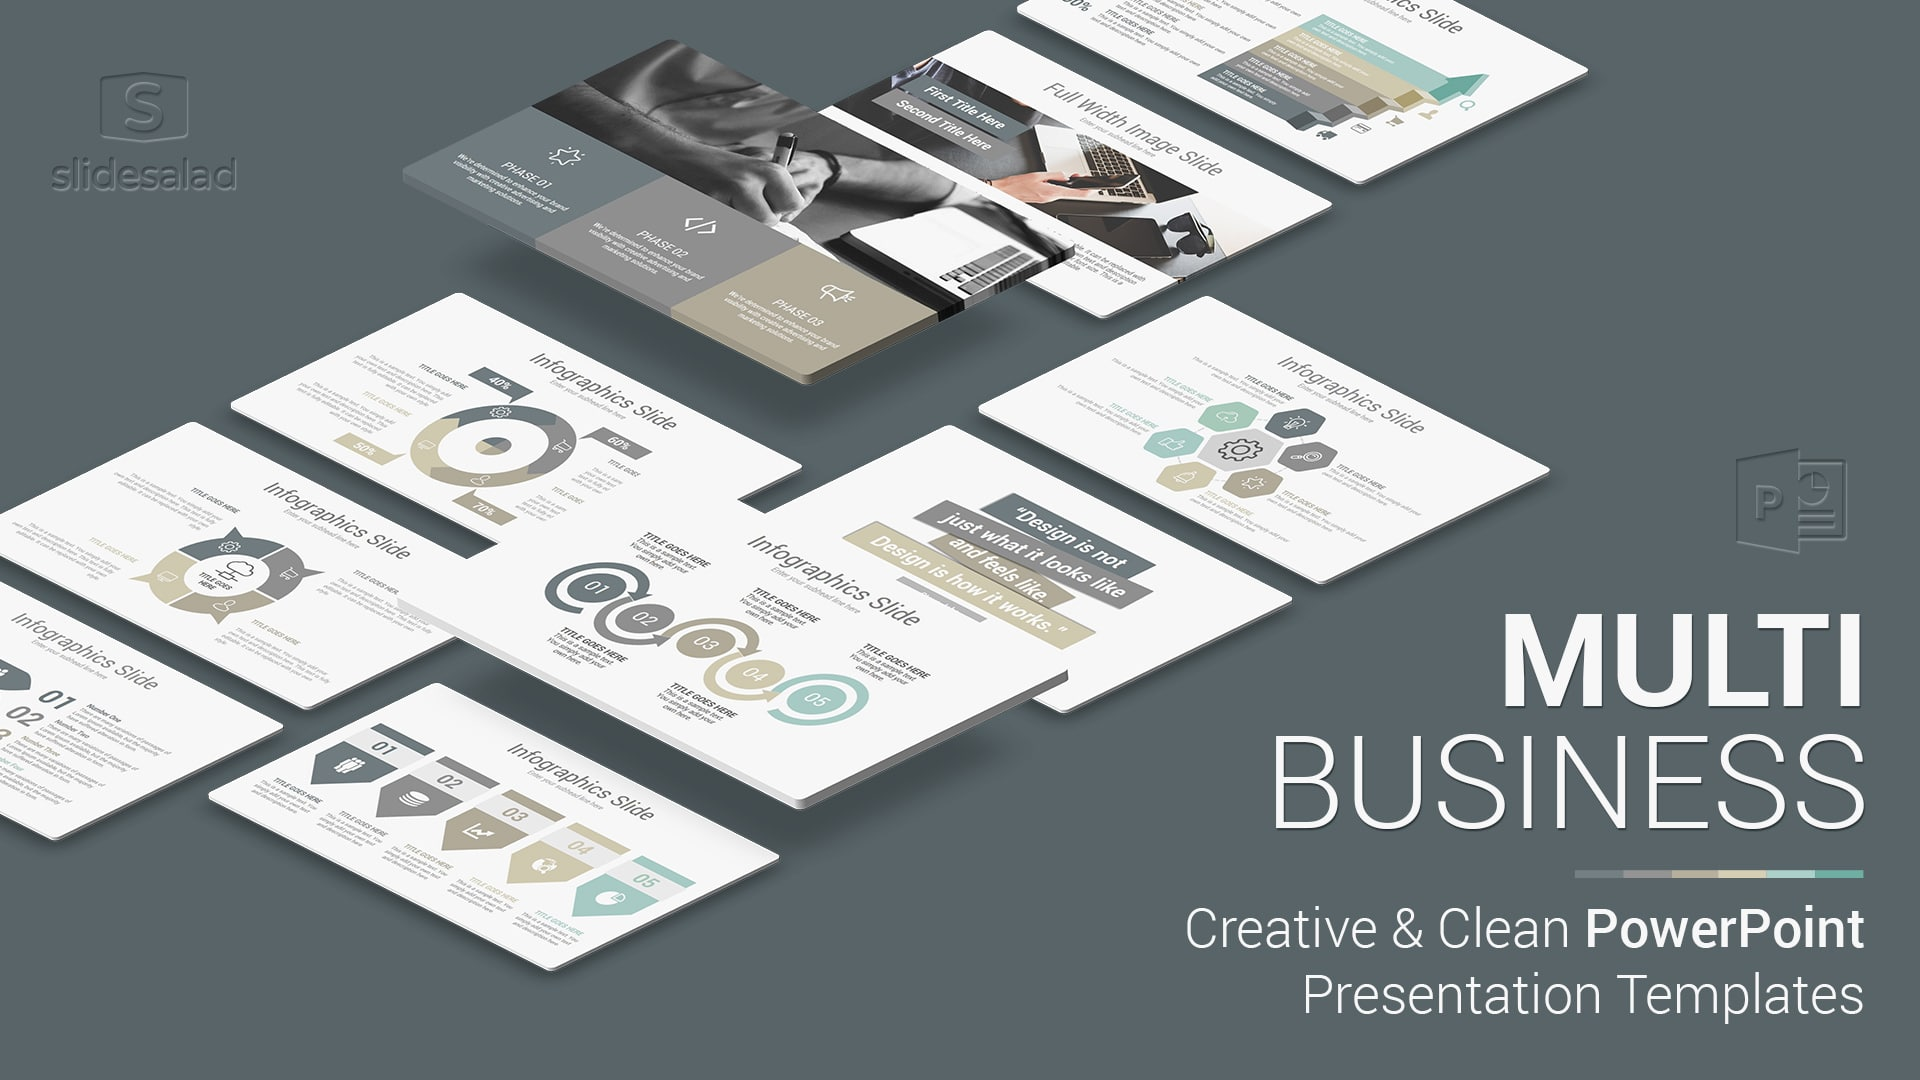 Multi Business PowerPoint Presentation Template – Motion Slides PPT Presentation Template